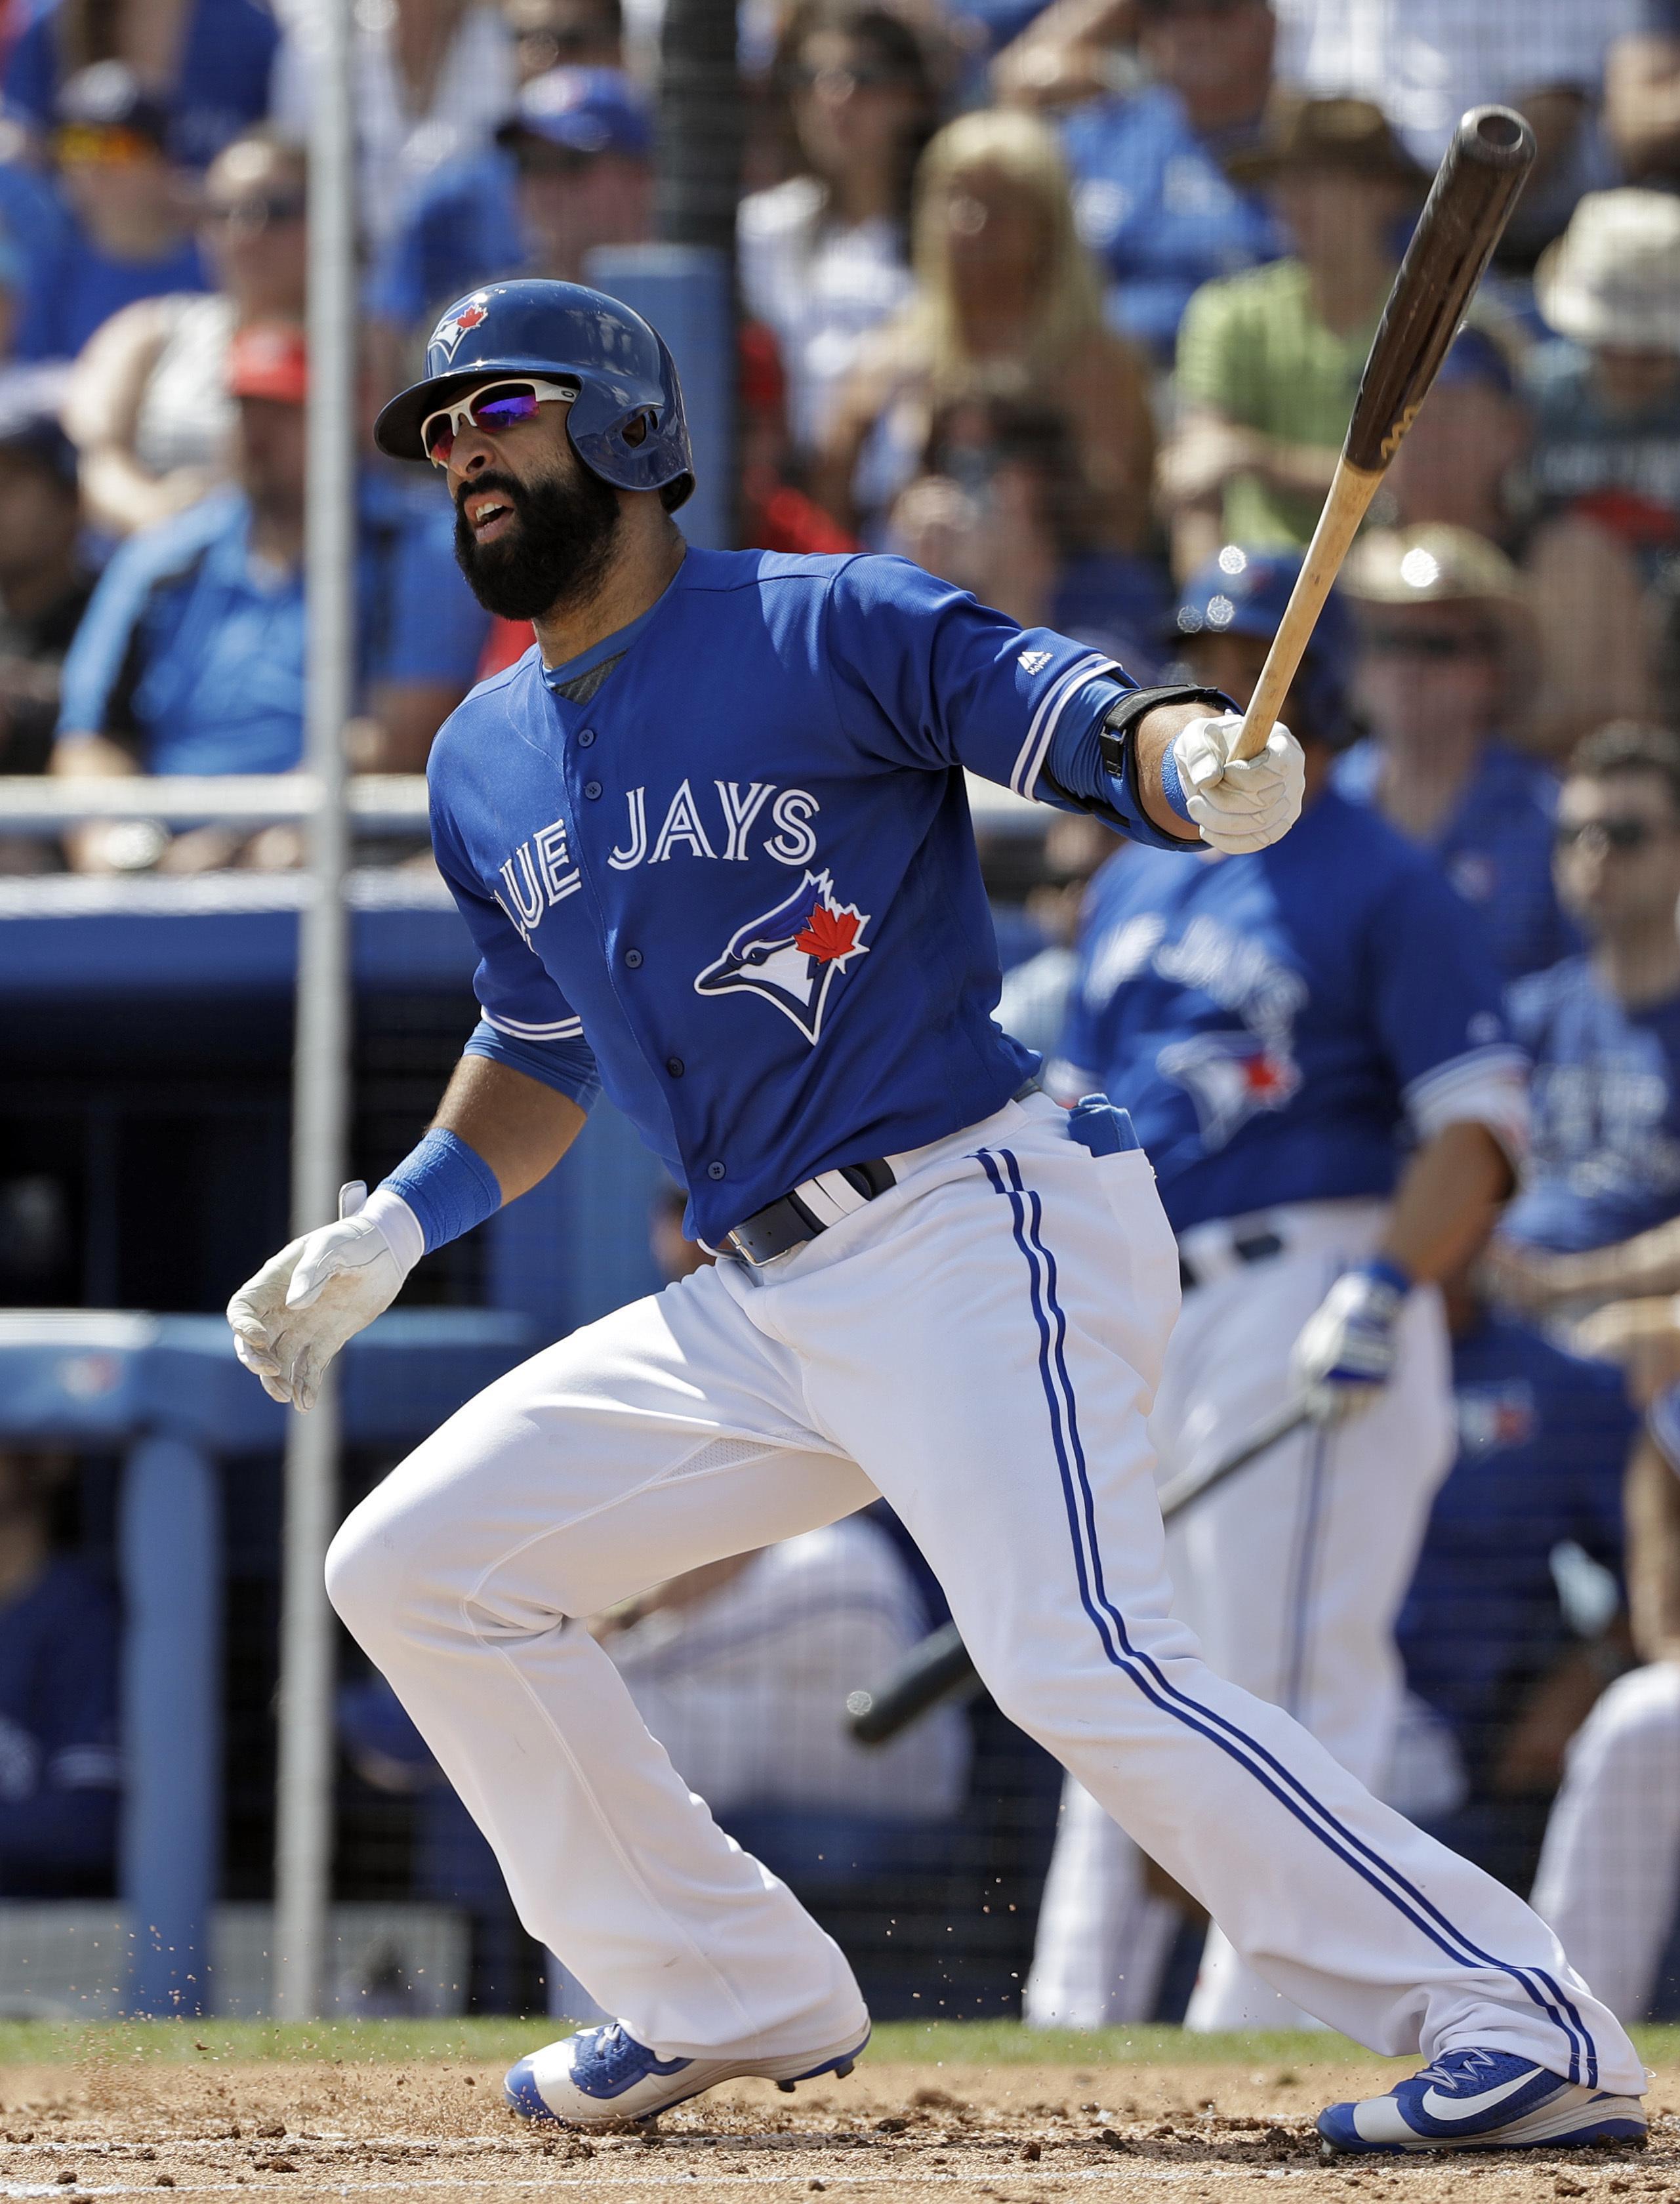 Blue_jays_preview_baseball_96341